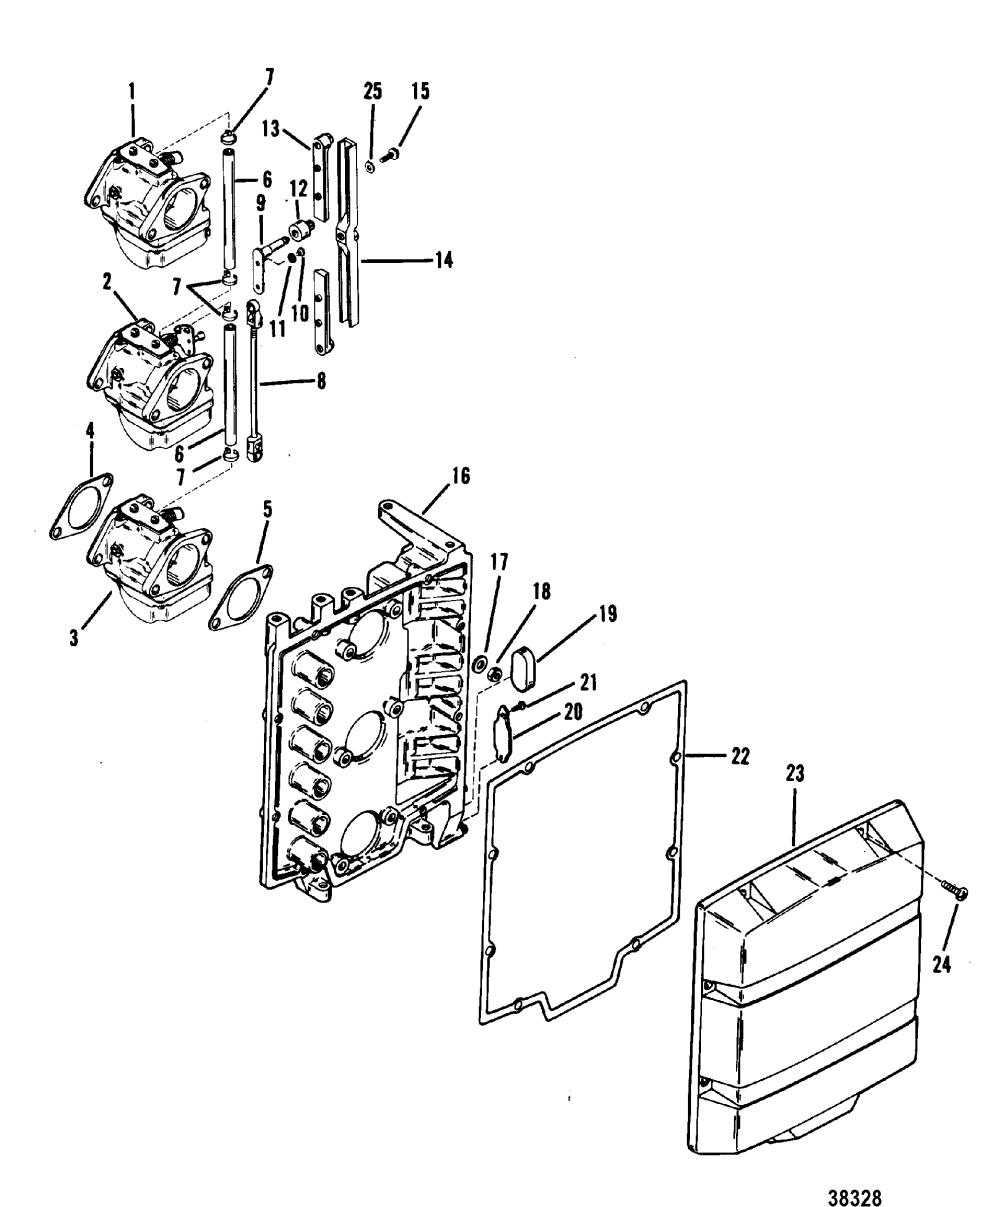 medium resolution of 75 mercury optimax wiring diagram layout wiring diagrams u2022 mercury outboard motor parts diagram 1988 mercury outboard diagram